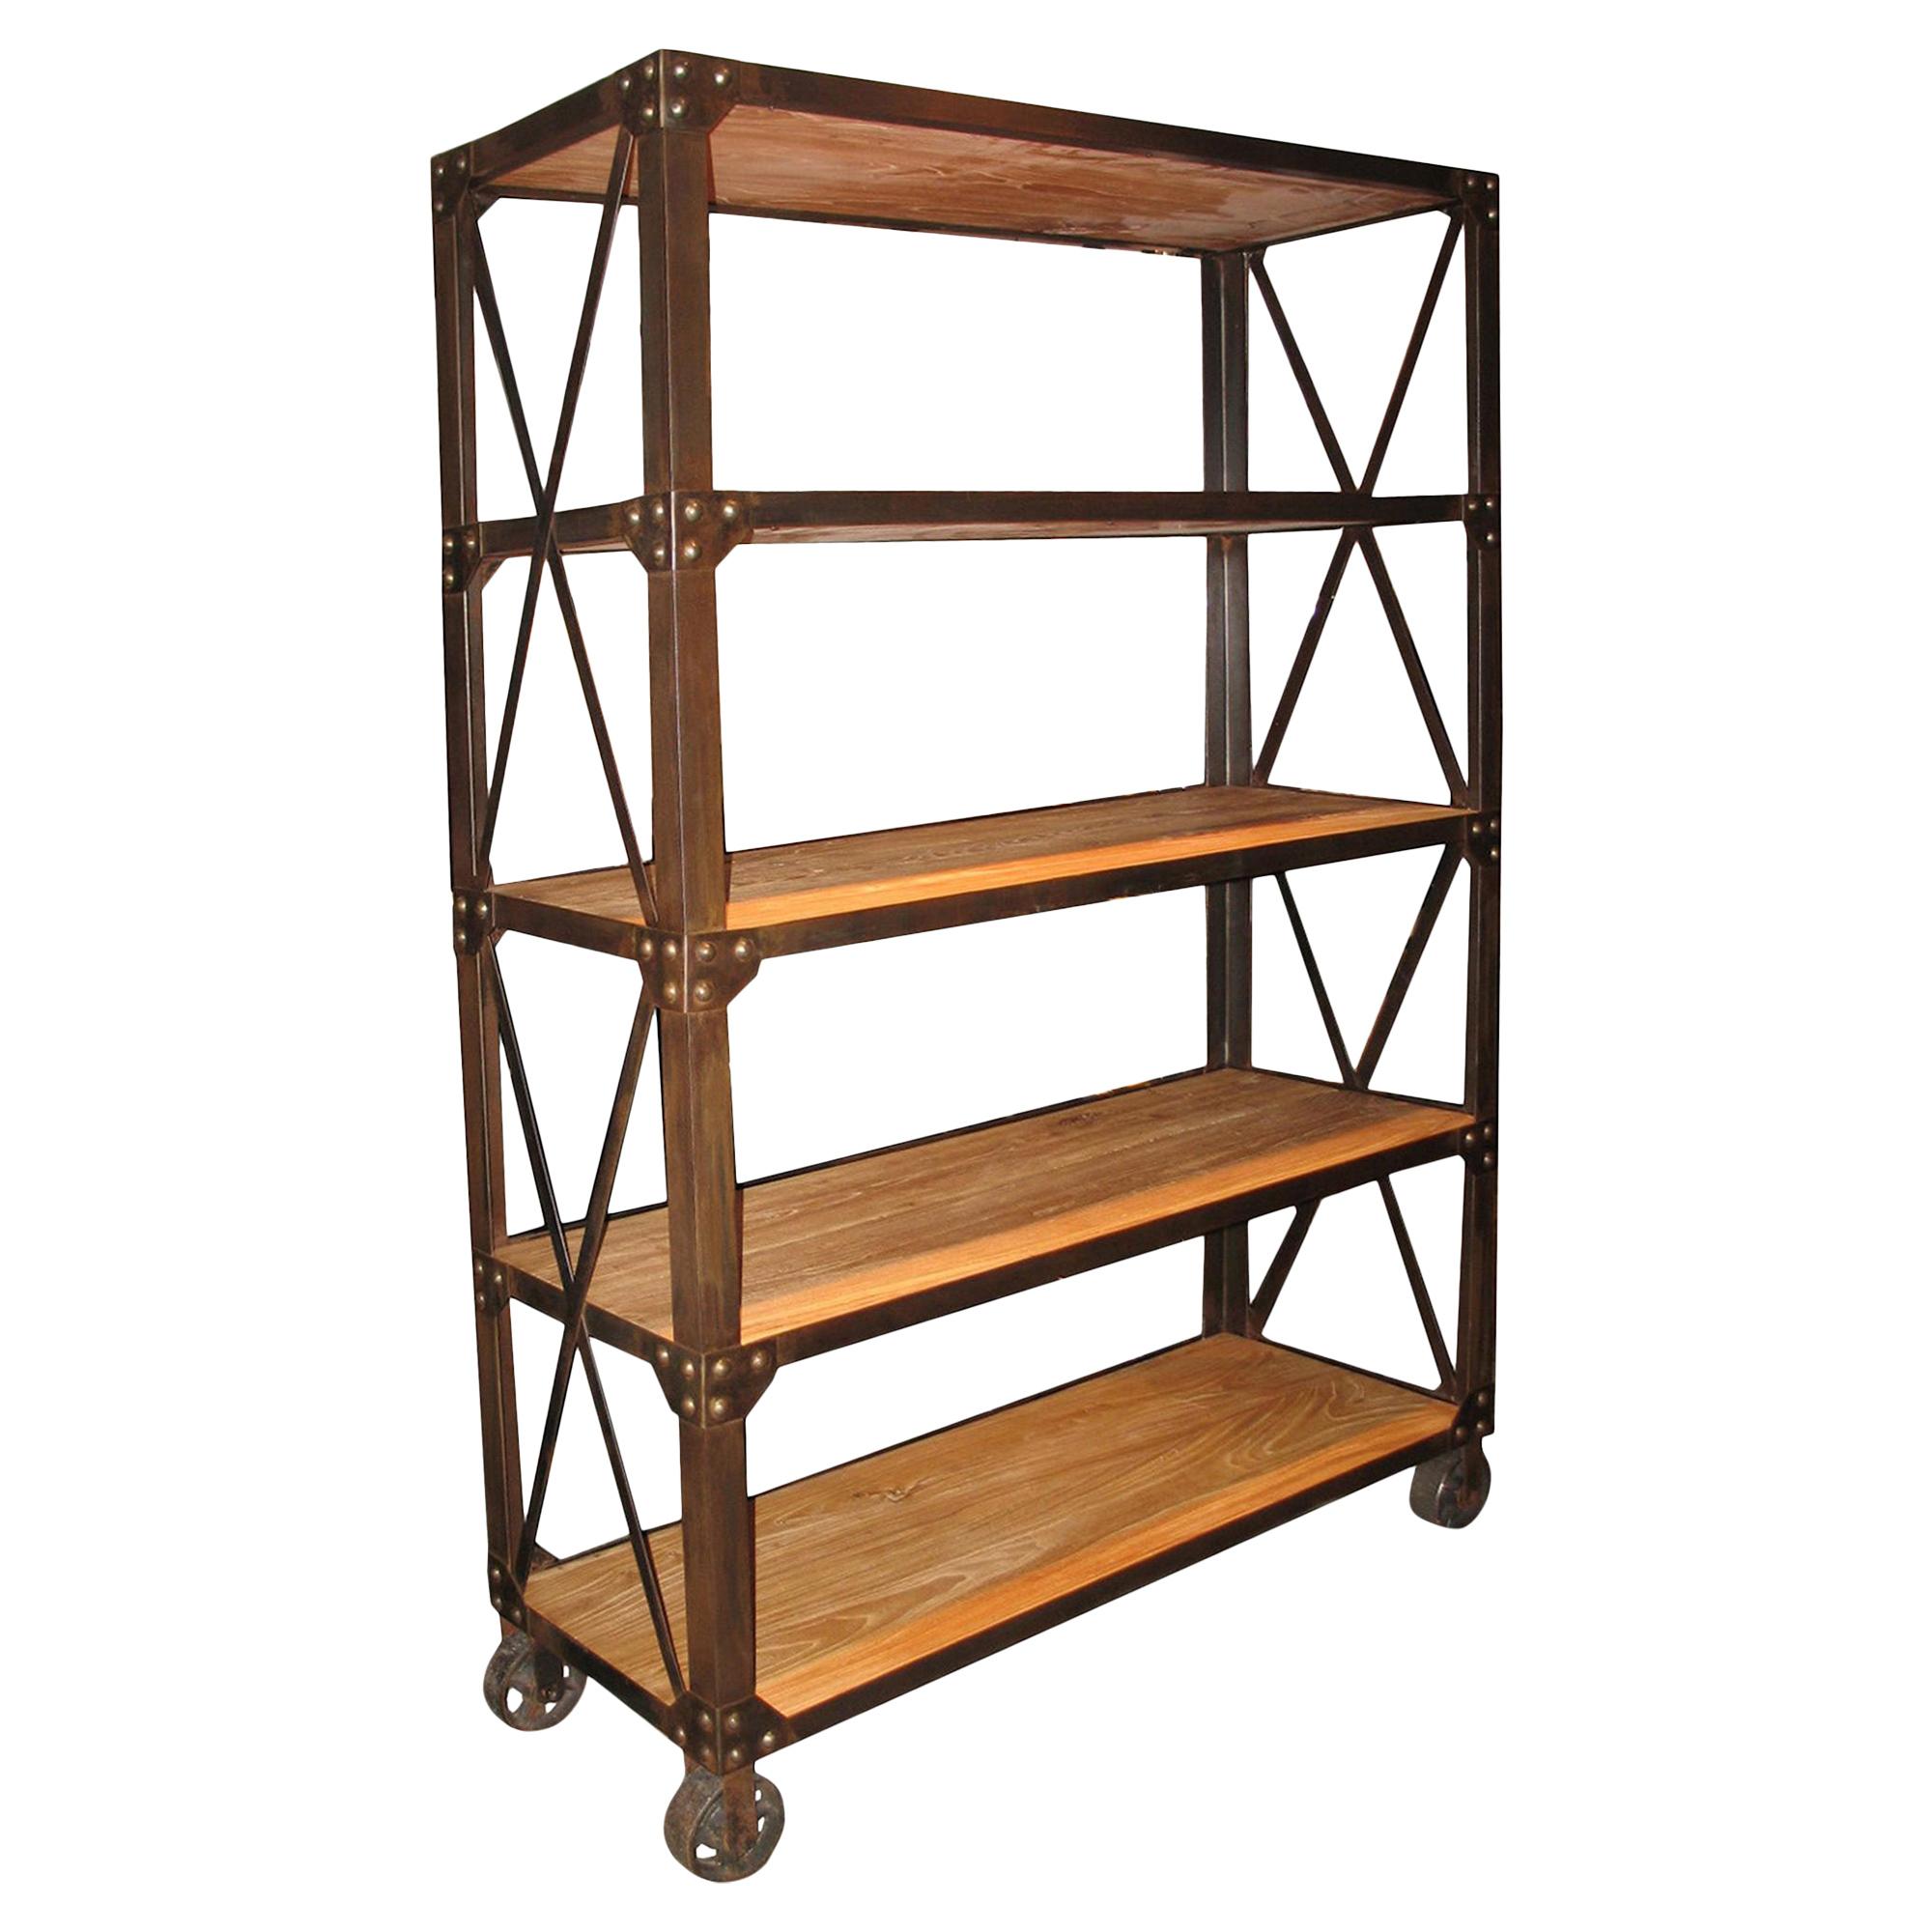 for black without on used bookshelf cheap chair stunning desk bookshelves breathtaking wheels sale